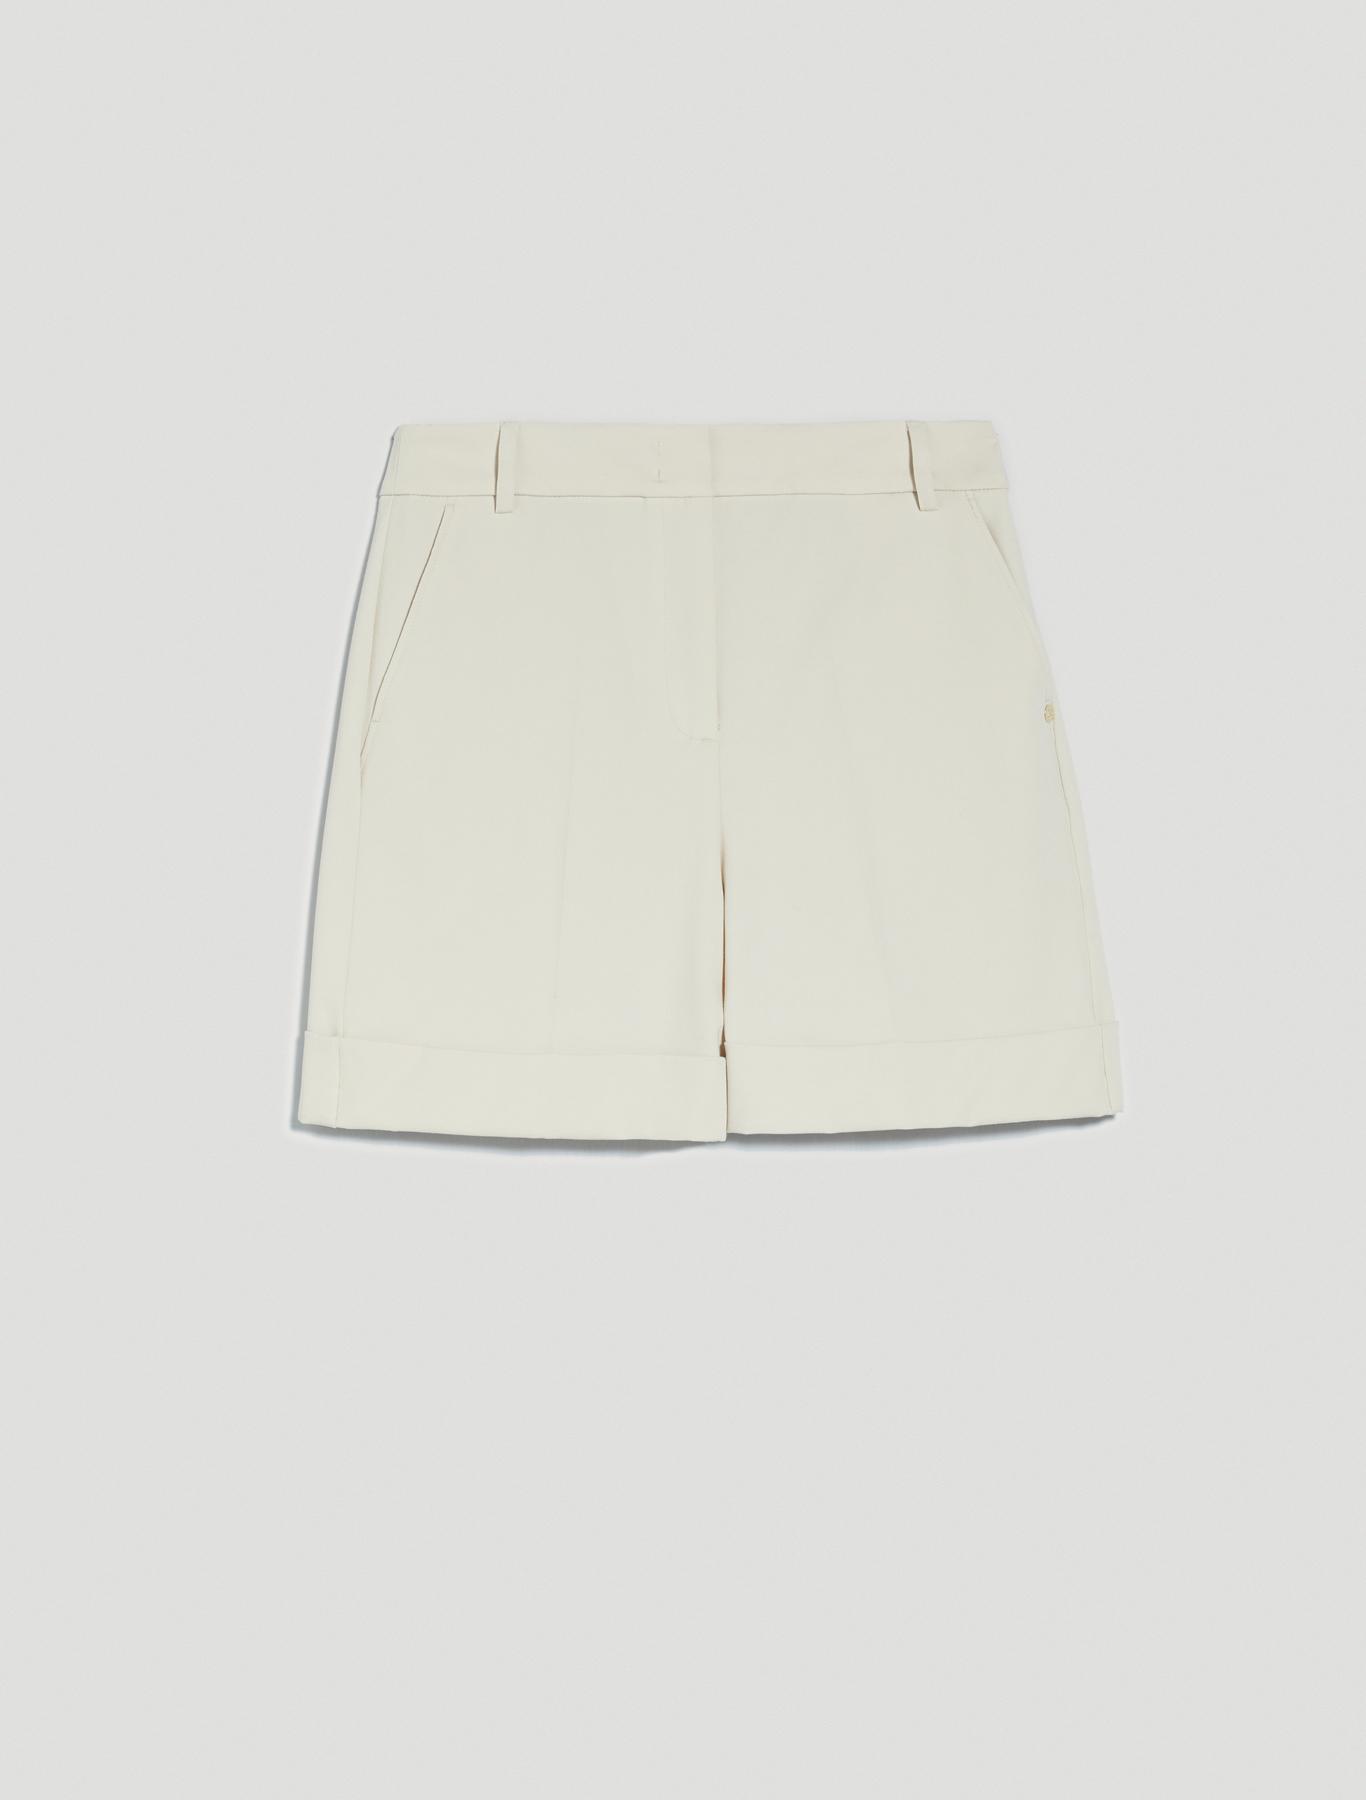 Twill Bermuda shorts - ivory - pennyblack